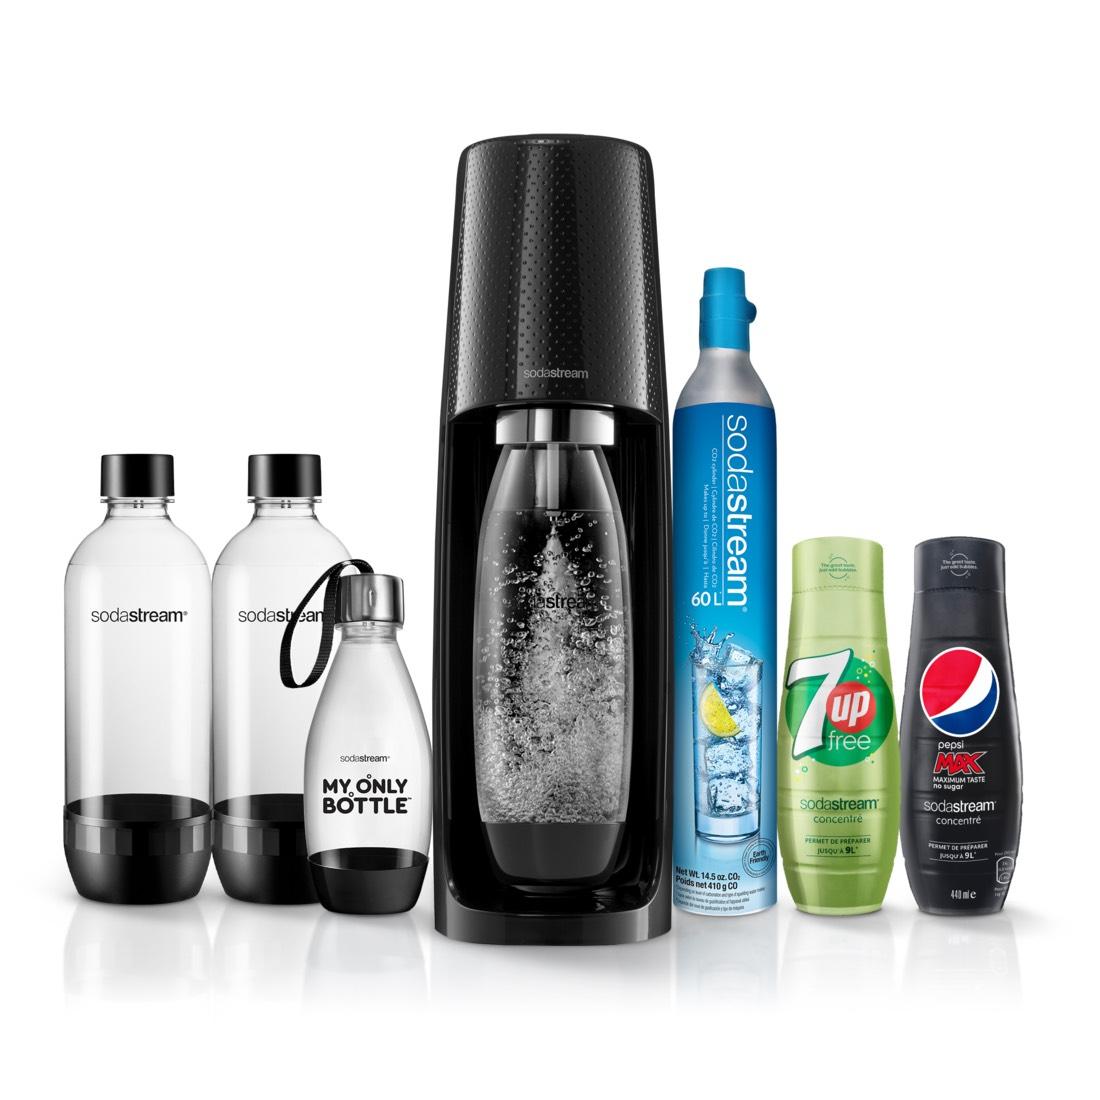 Machine à gazéifier Sodastream Spirit Pack expert : 3 Bouteilles + 1 Cylindre + 2 Concentrés